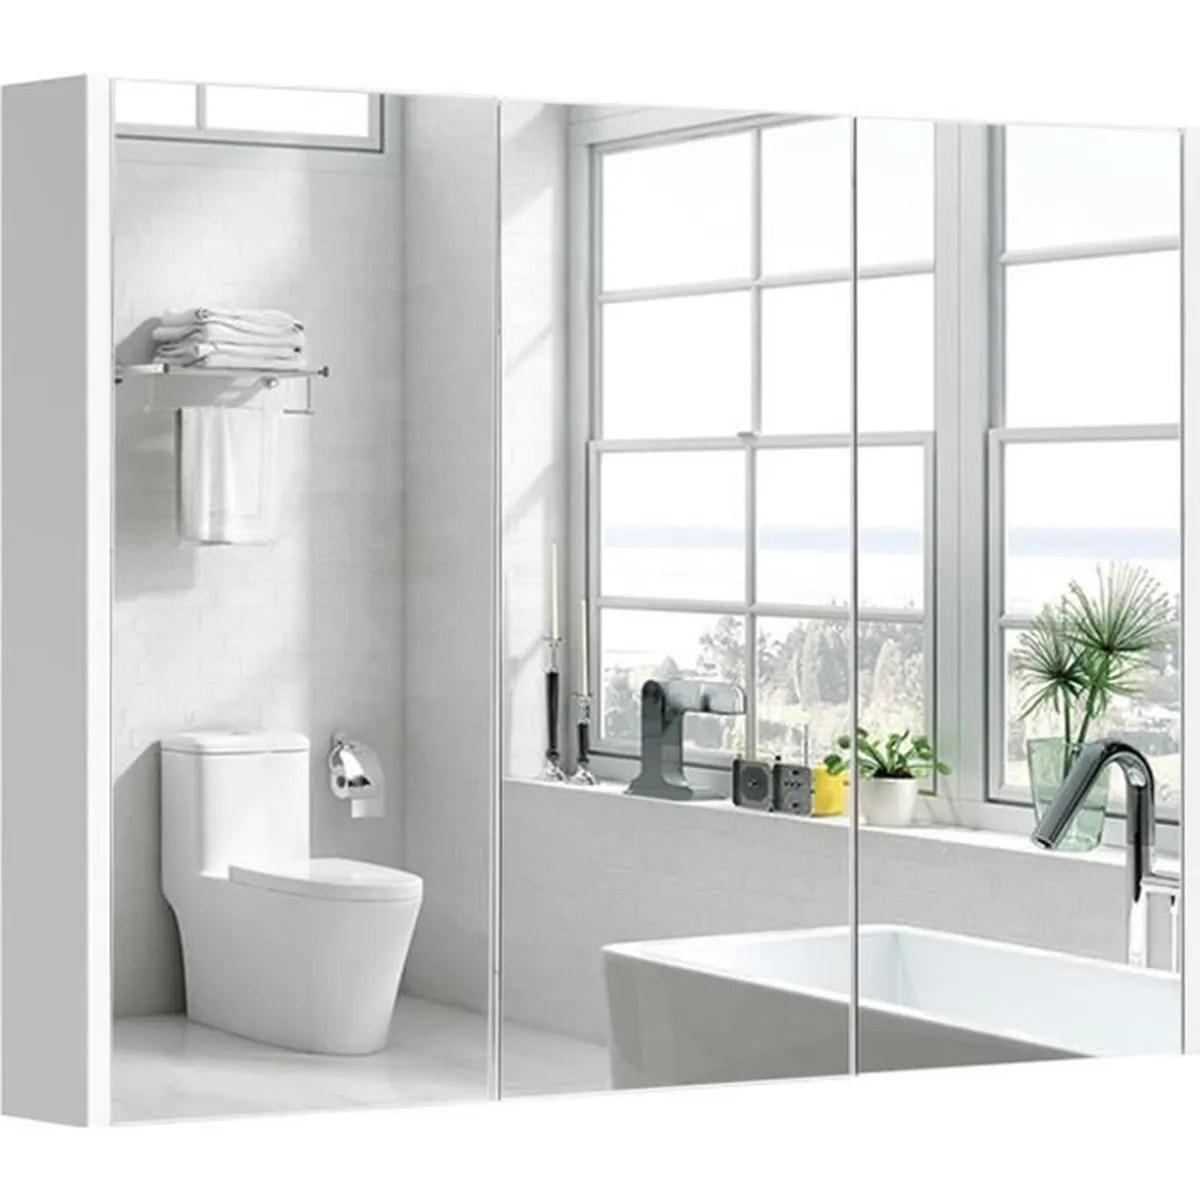 Armoire De Toilette Salle De Bain A Miroir Murale